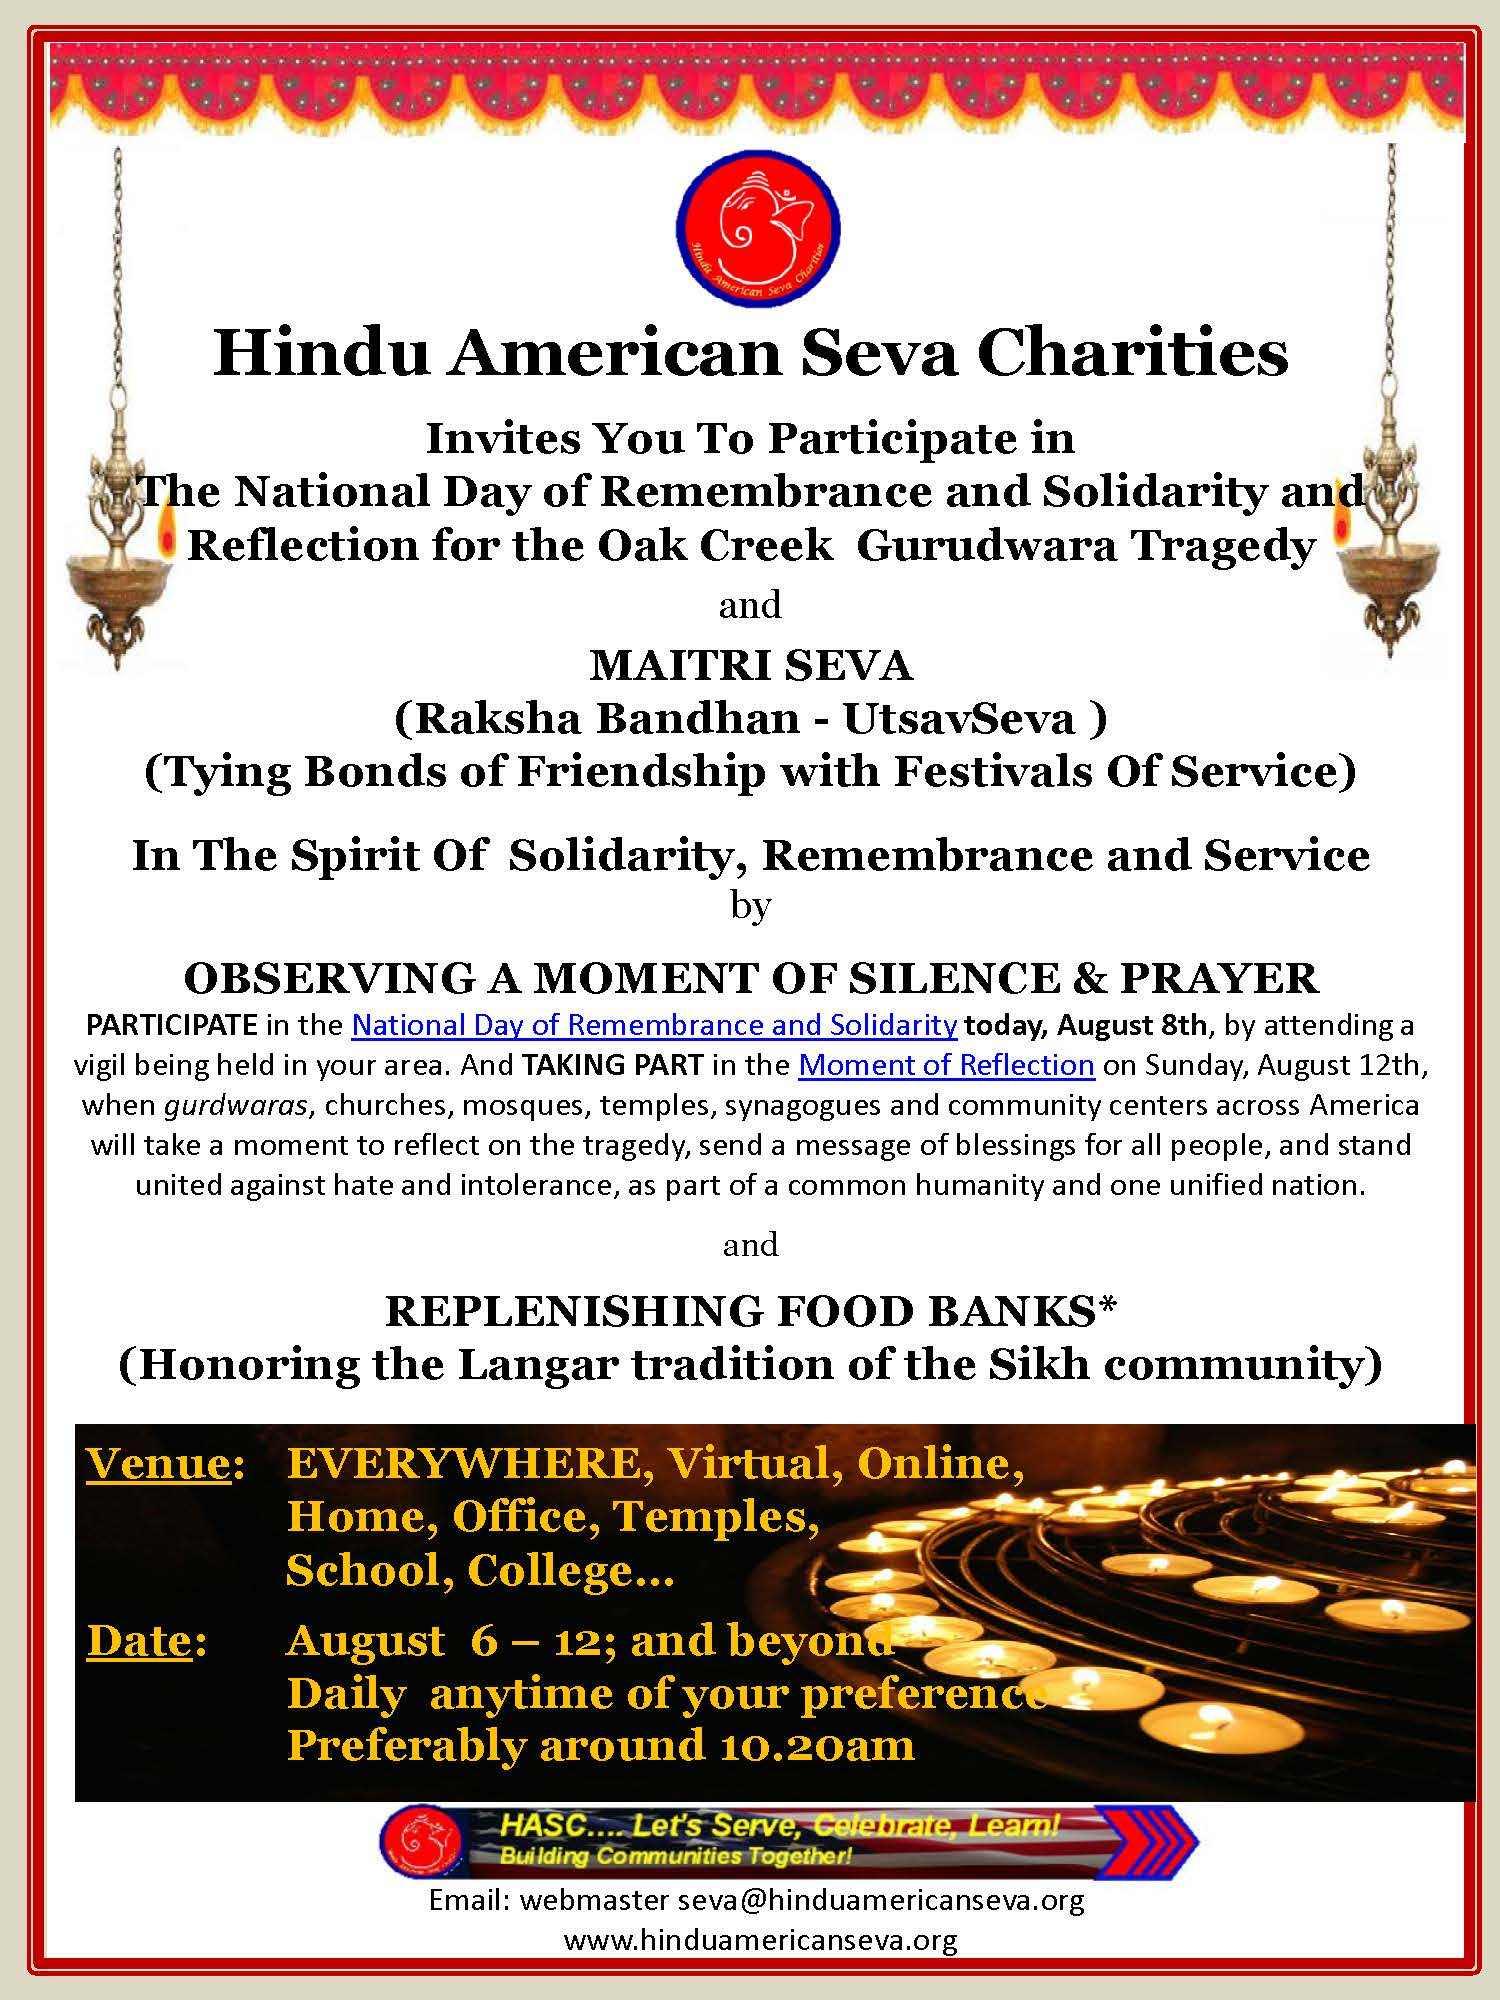 2012-08-09-SikhVigilHASCflyerNationalSolidarity.jpg